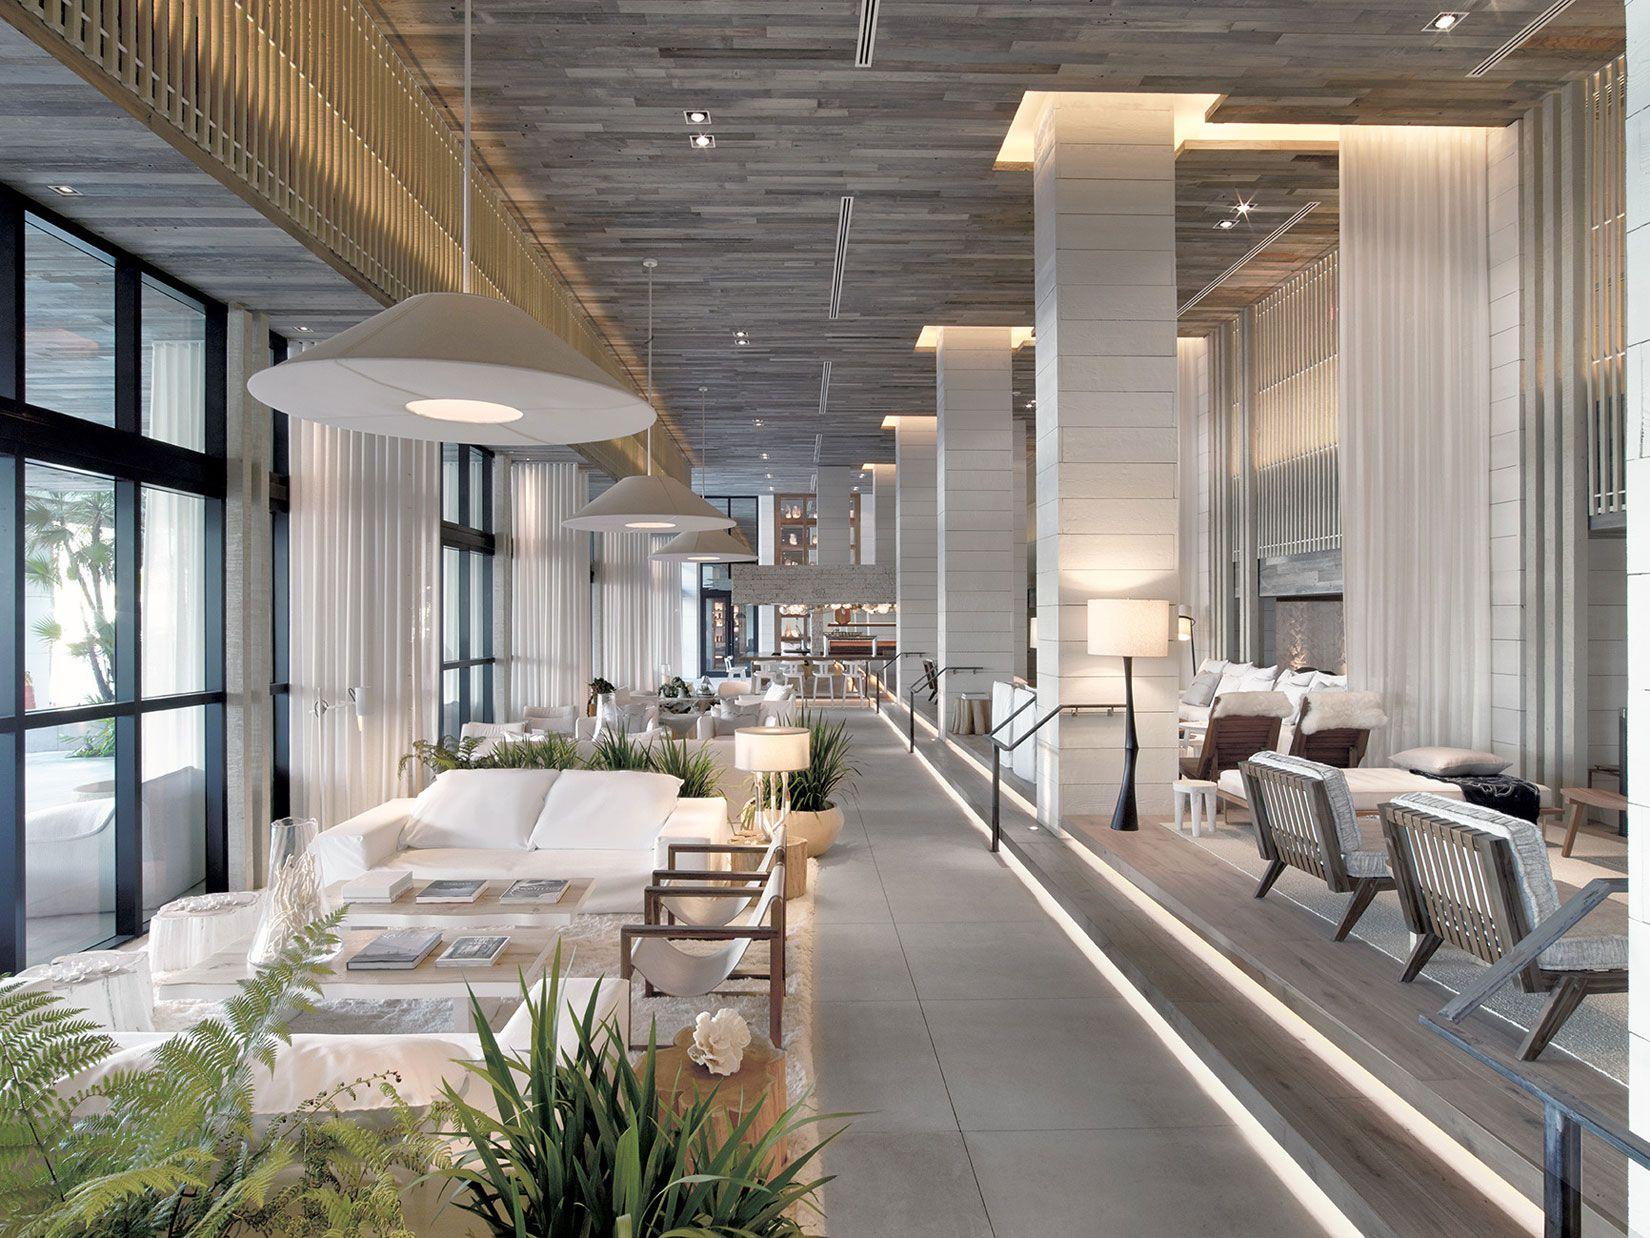 Office lobby interior meyer design inc - 1 Hotel South Beach 05